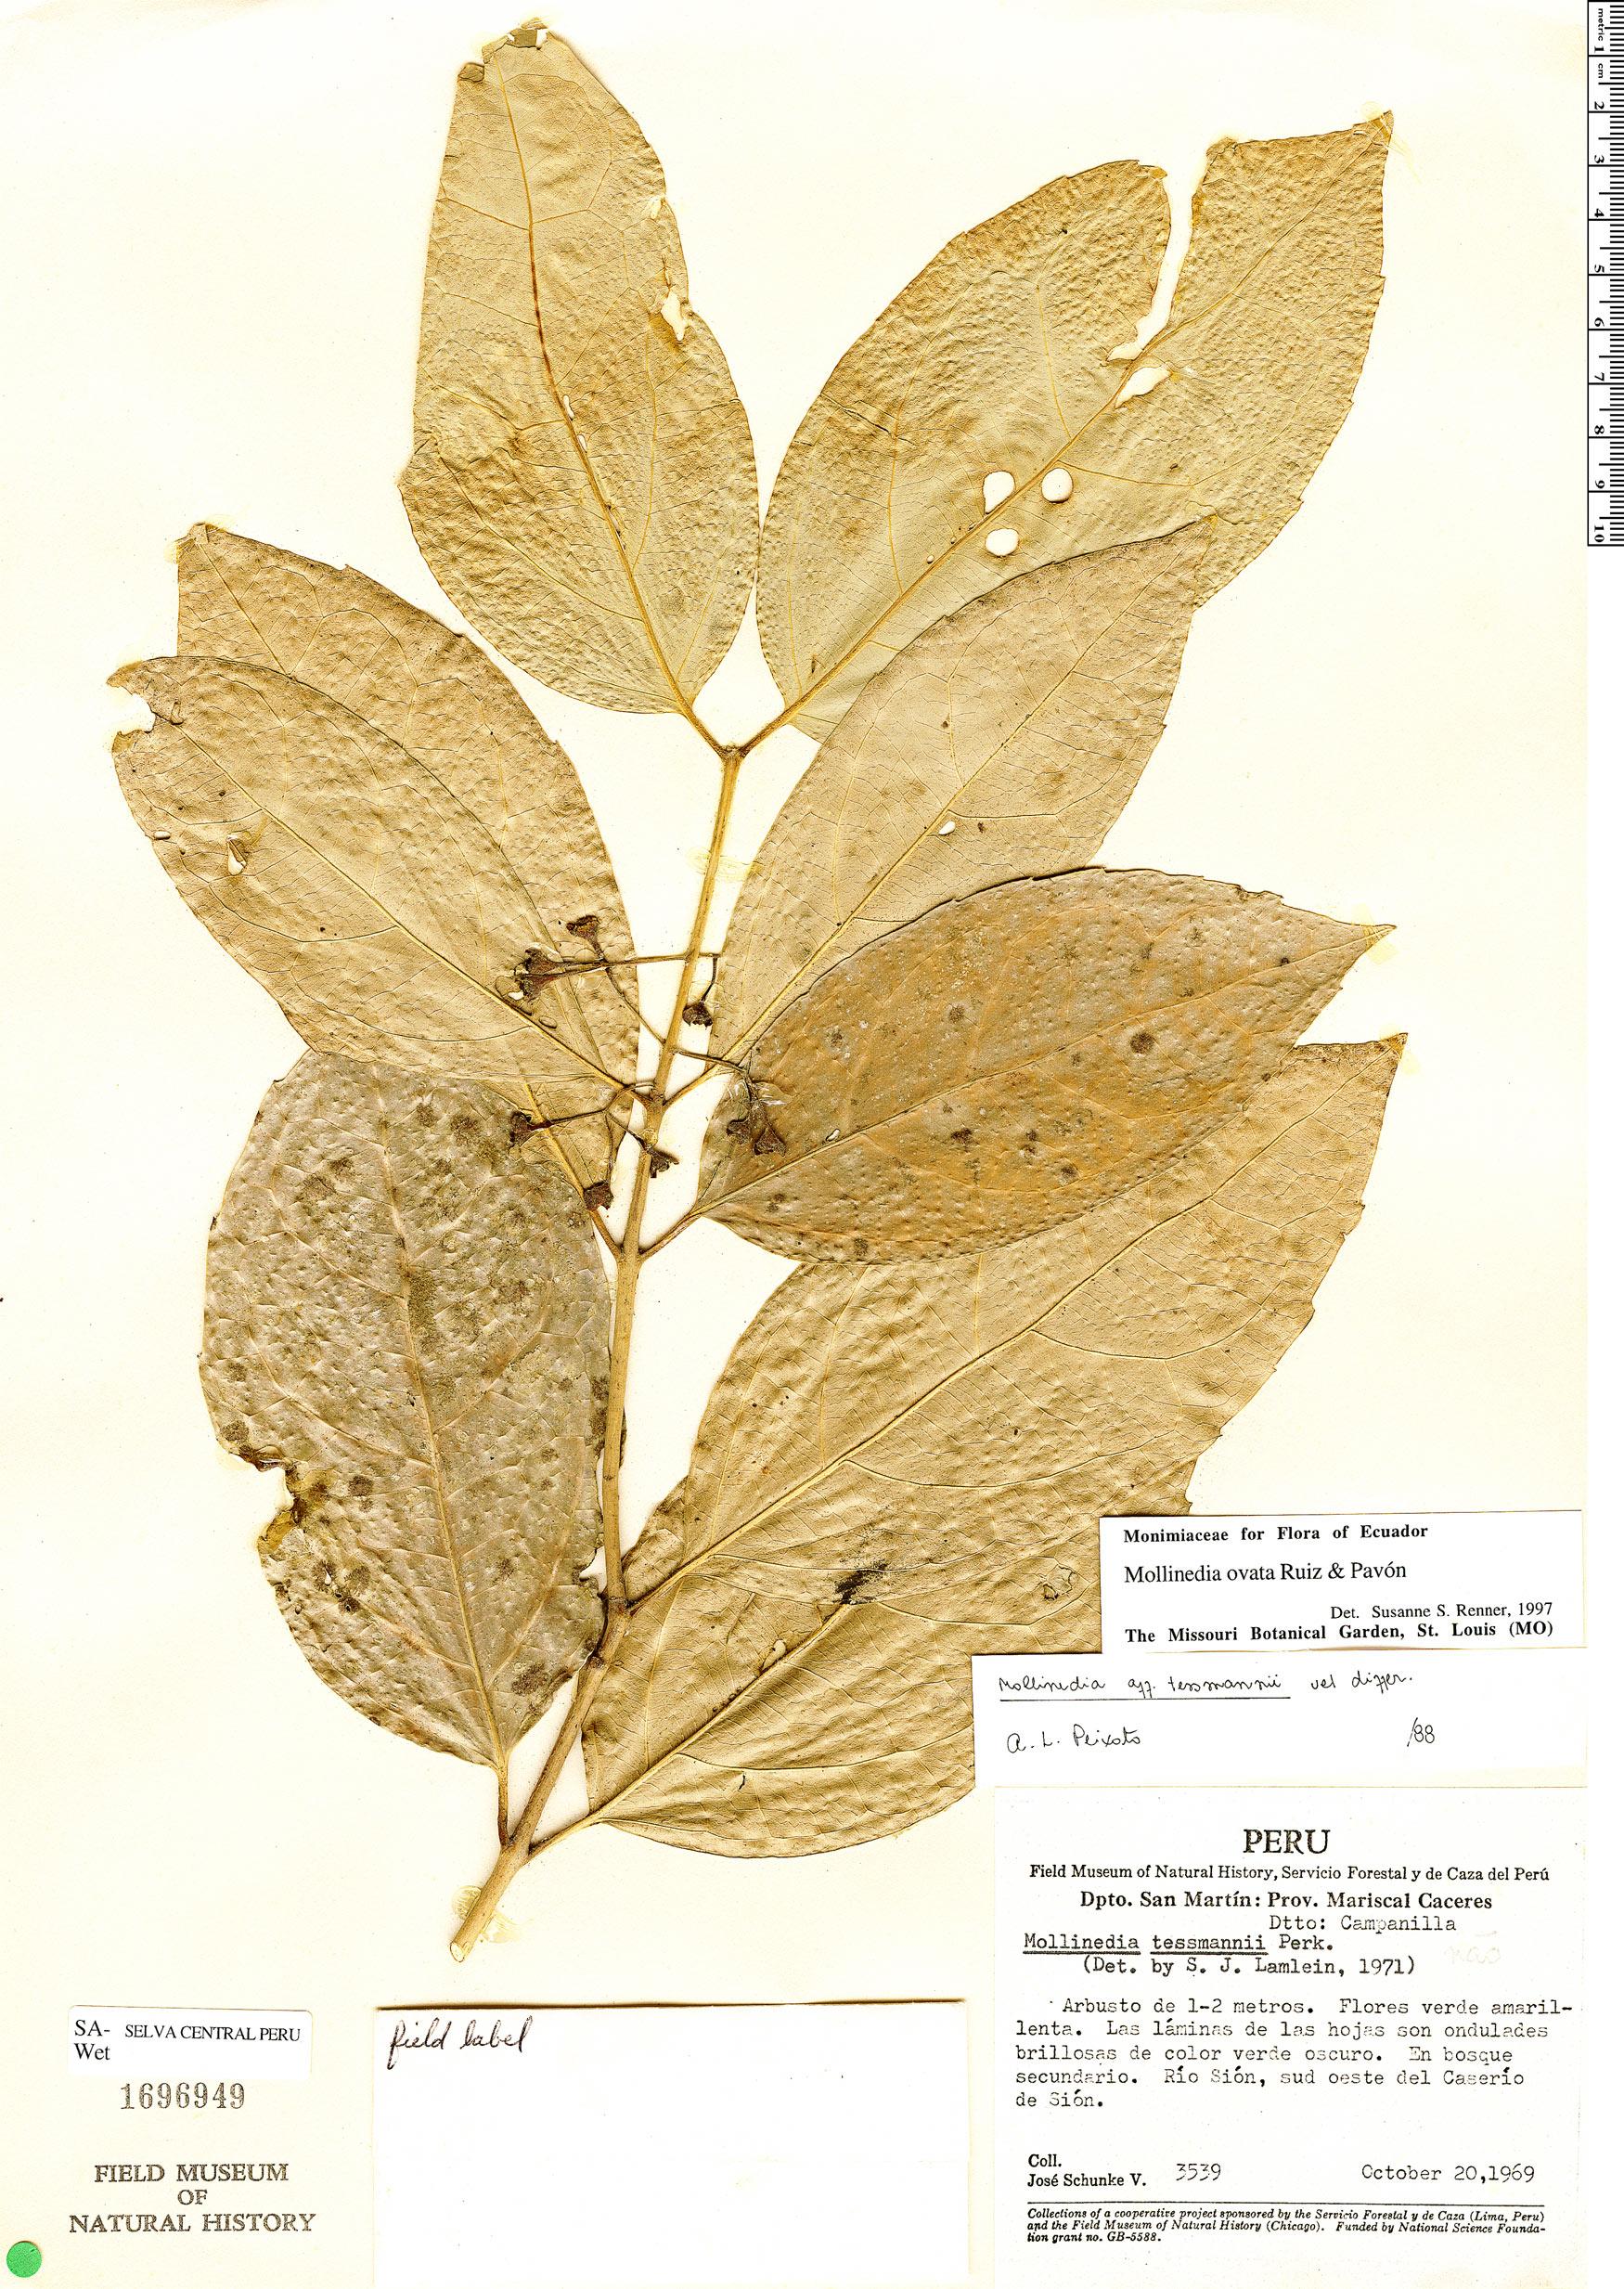 Specimen: Mollinedia ovata